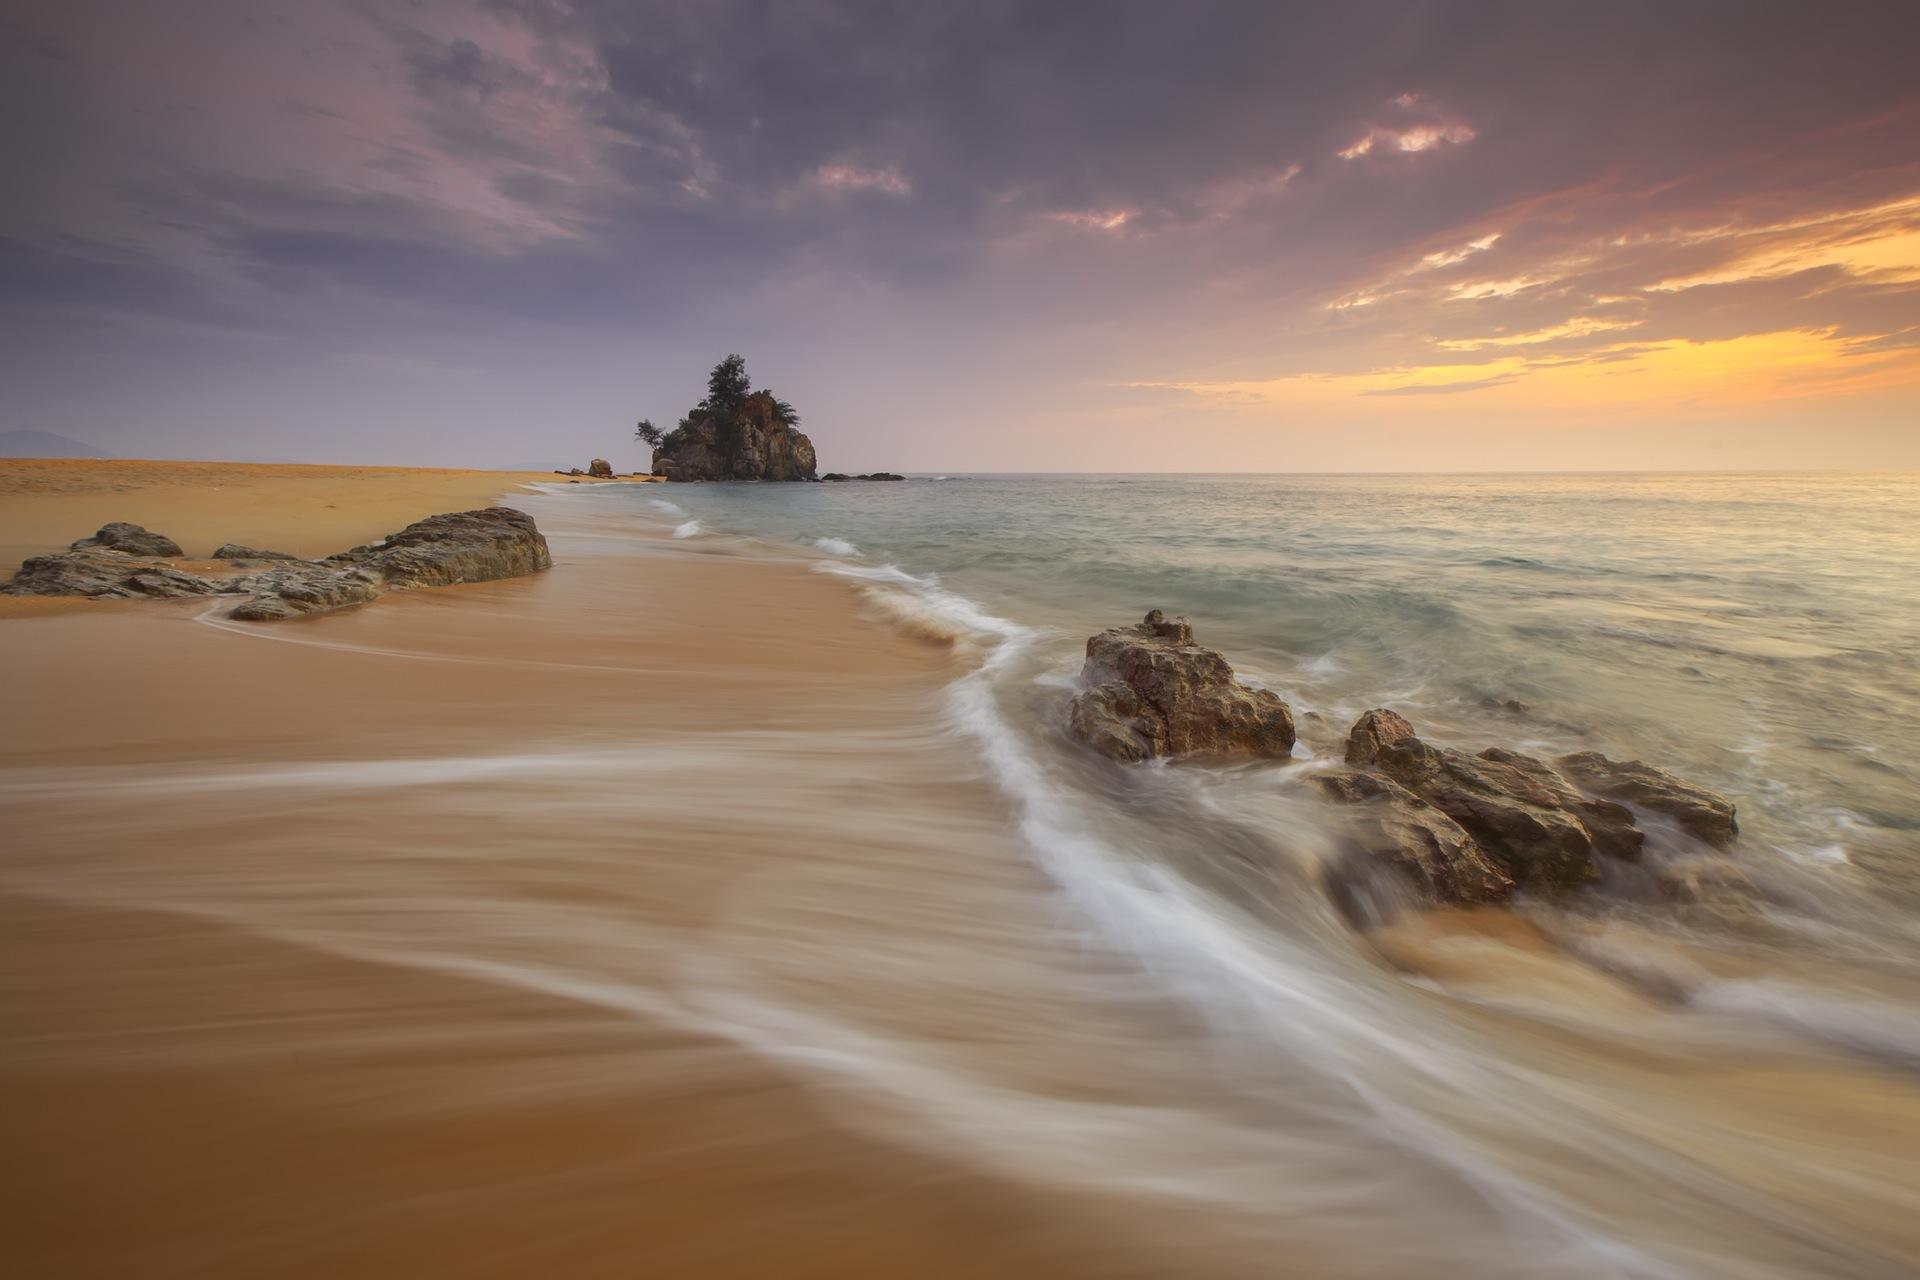 playa, rocas, arena, olas, kemasik, mar, atardecer - Fondos de Pantalla HD - professor-falken.com